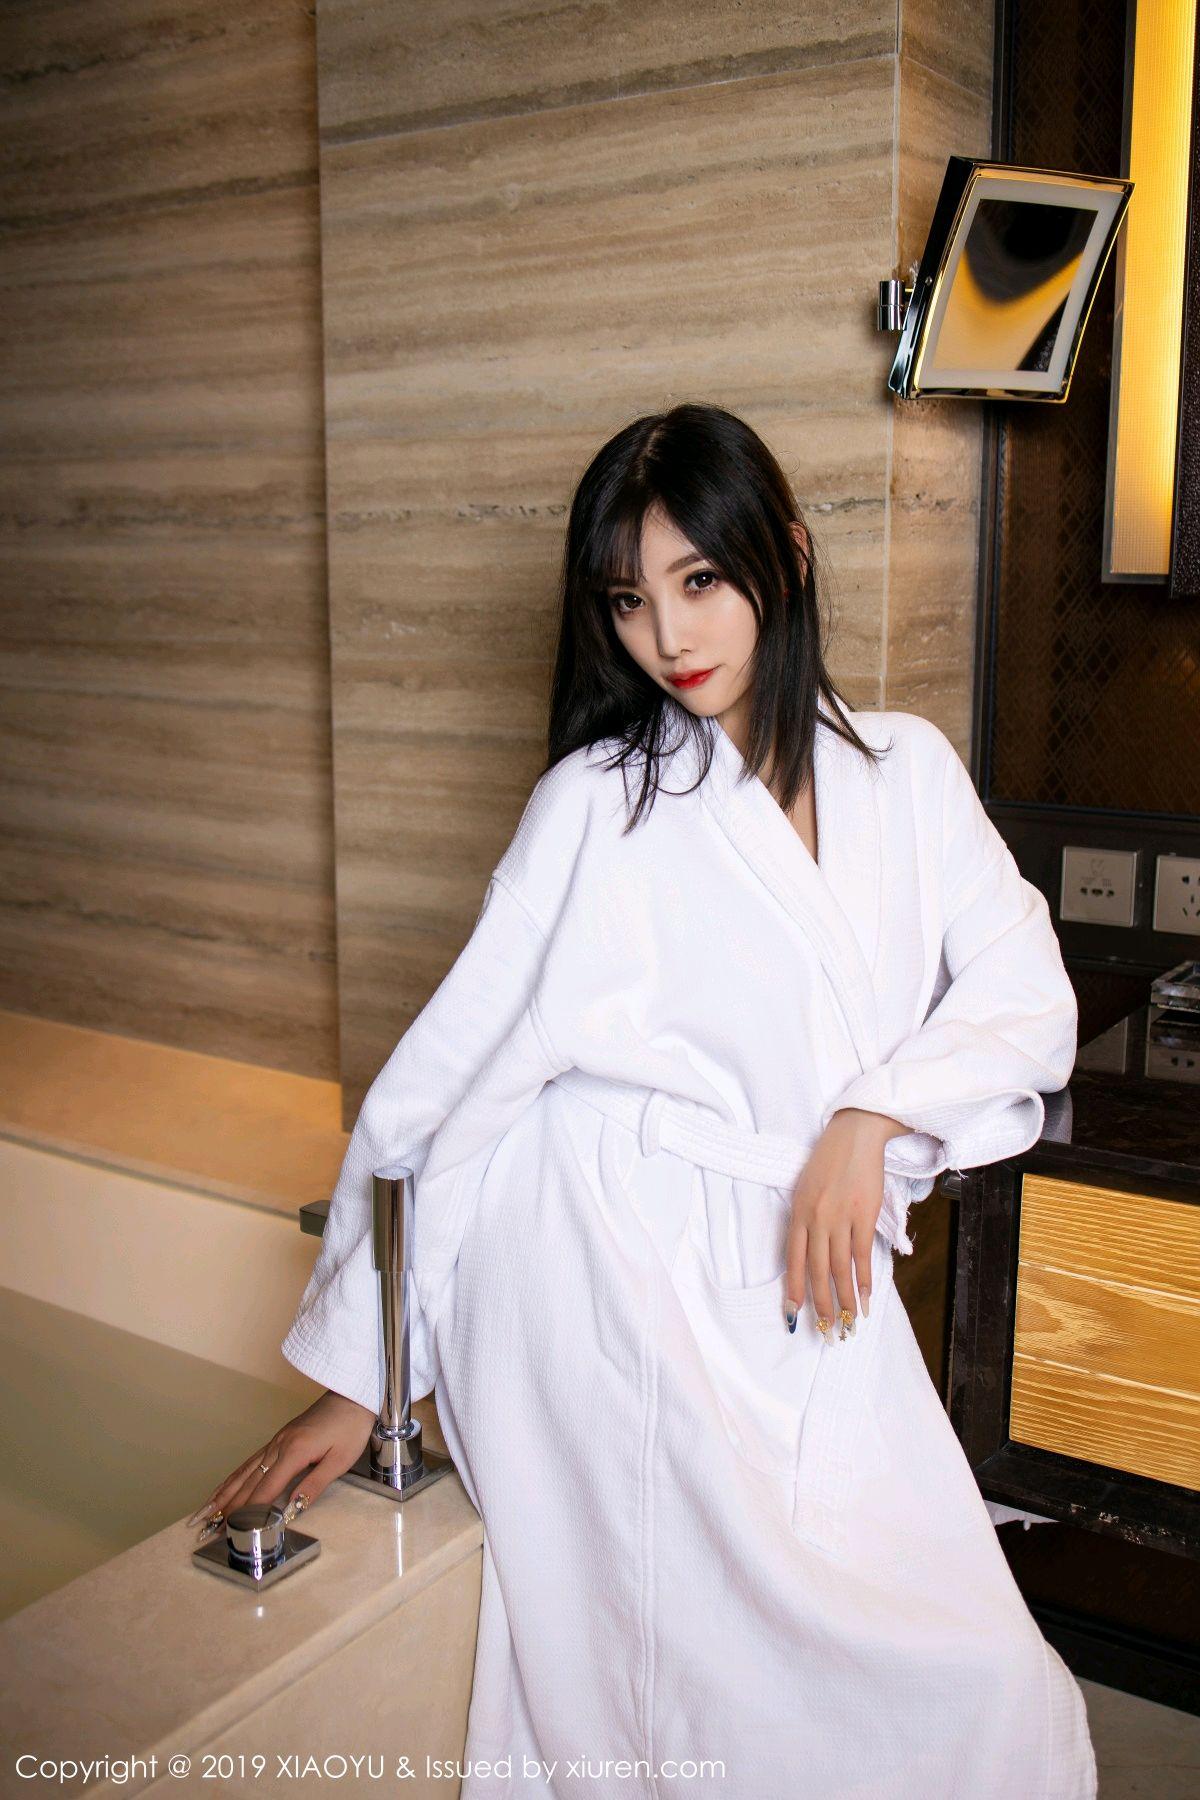 [XiaoYu] Vol.153 Yang Chen Chen 2P, Bathroom, Black Silk, Underwear, XiaoYu, Yang Chen Chen